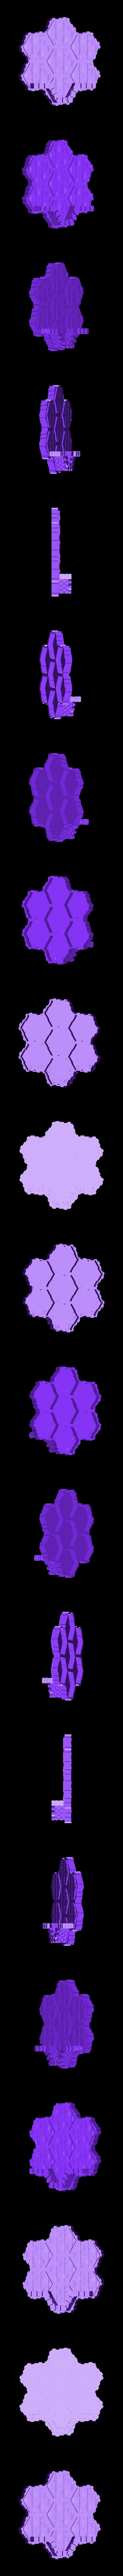 7hex_stone_with_wall_1.stl Download free STL file Locking Hex Terrain Stone Path • 3D print object, mrhers2